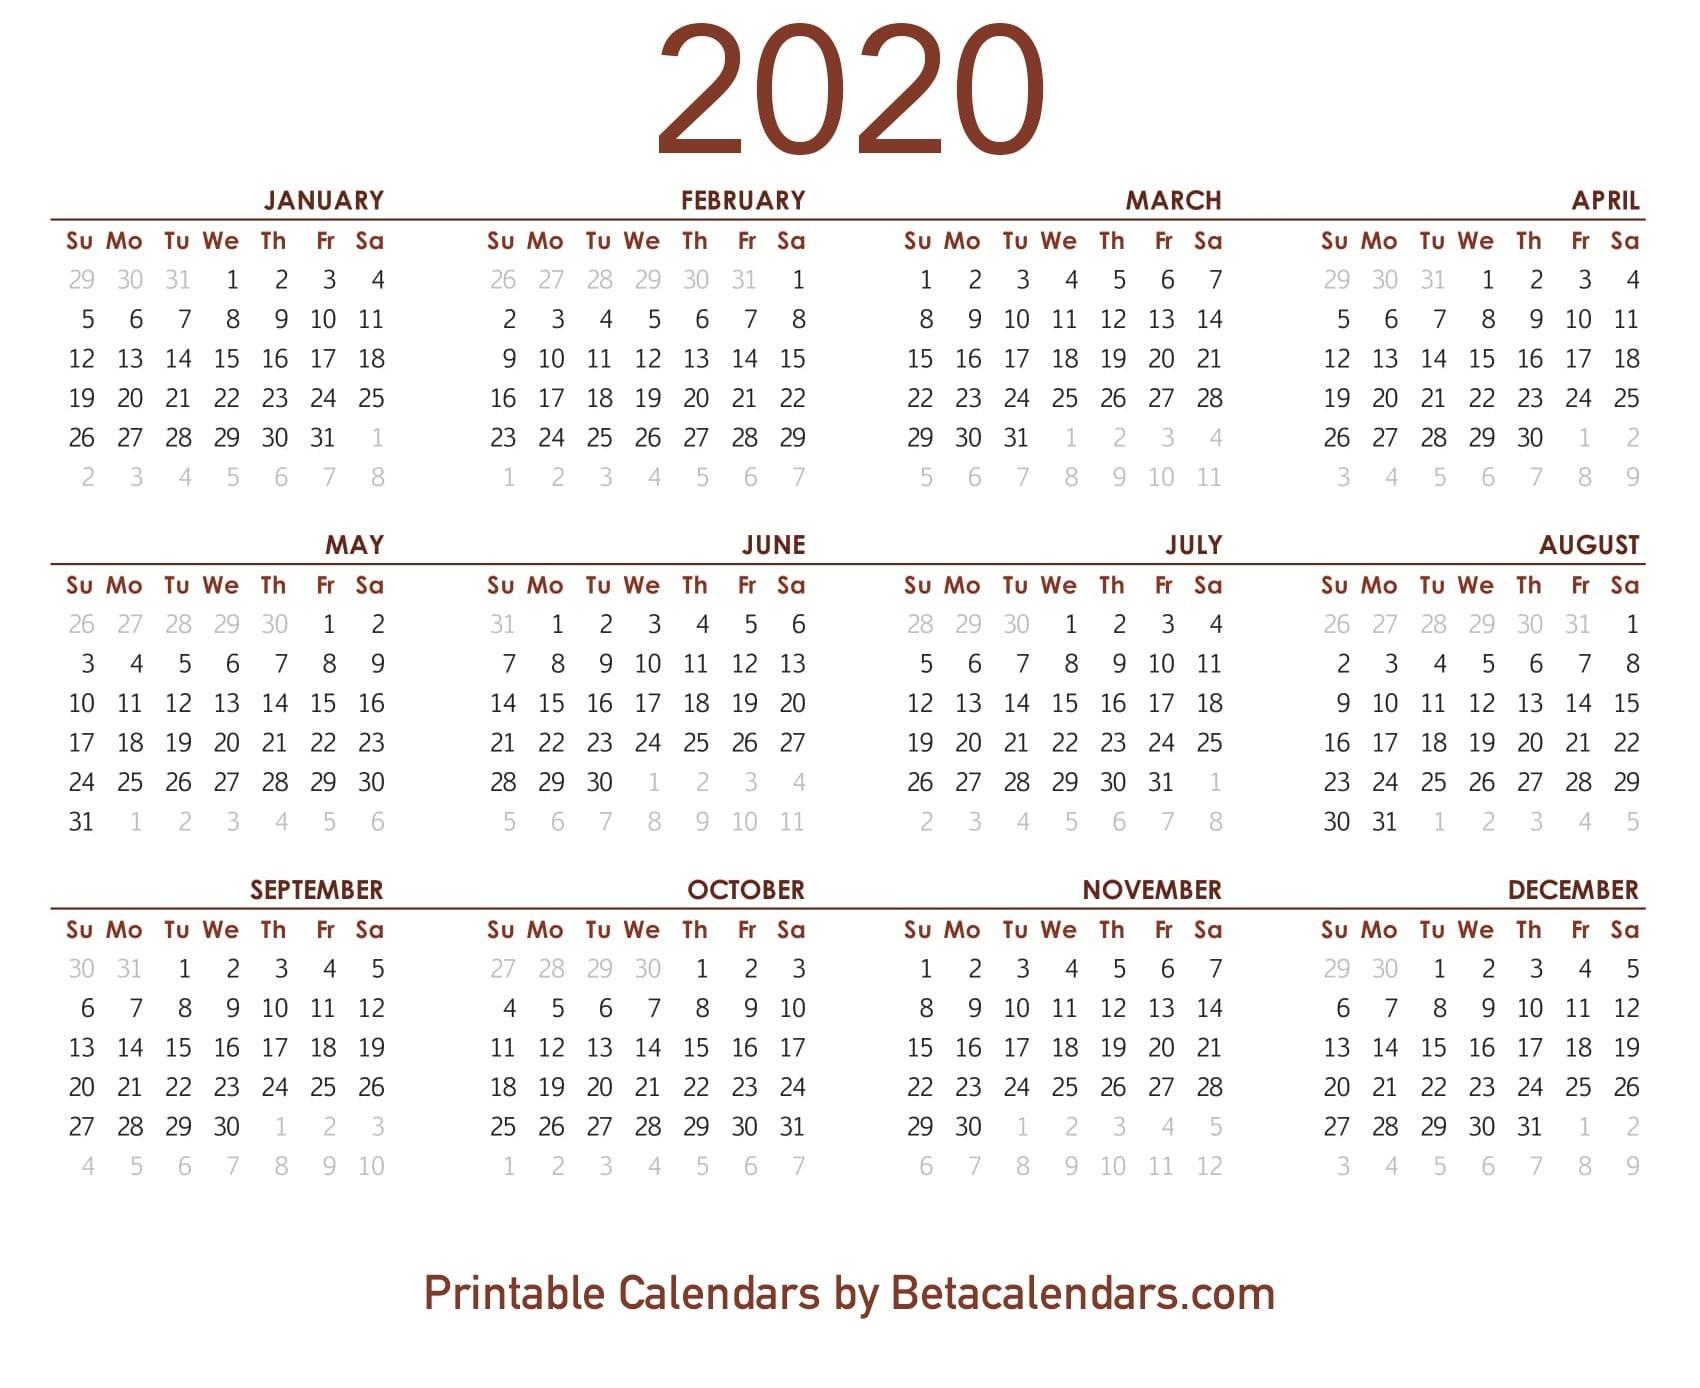 2020 Calendar - Beta Calendars  Full Page Printable 2020 Calendar